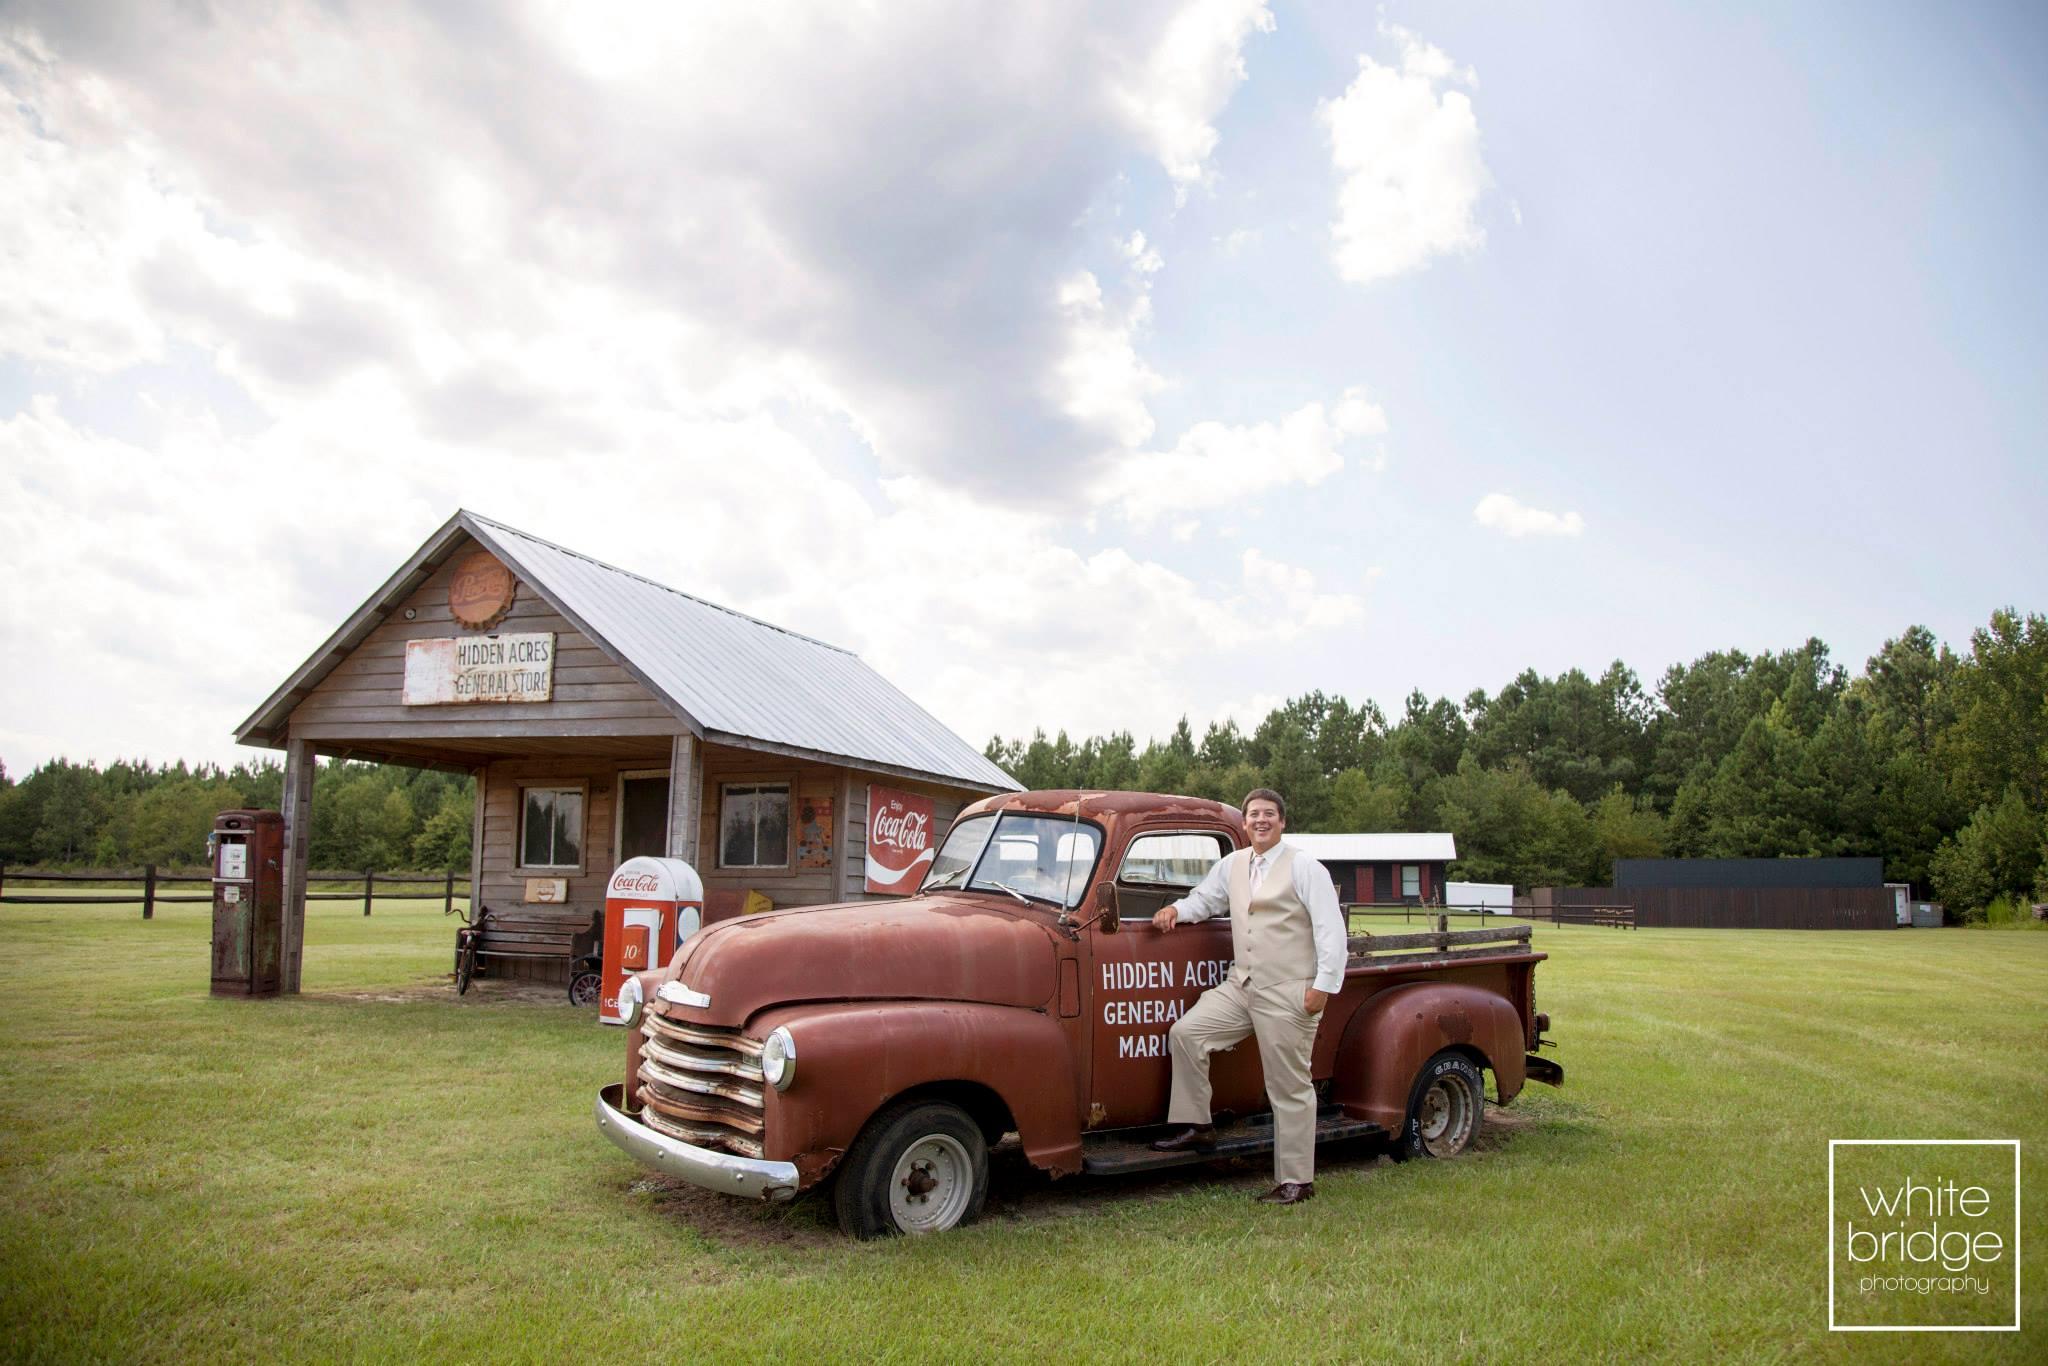 Hidden Acres Real Wedding | Hannah & Josh | White Bridge Photography